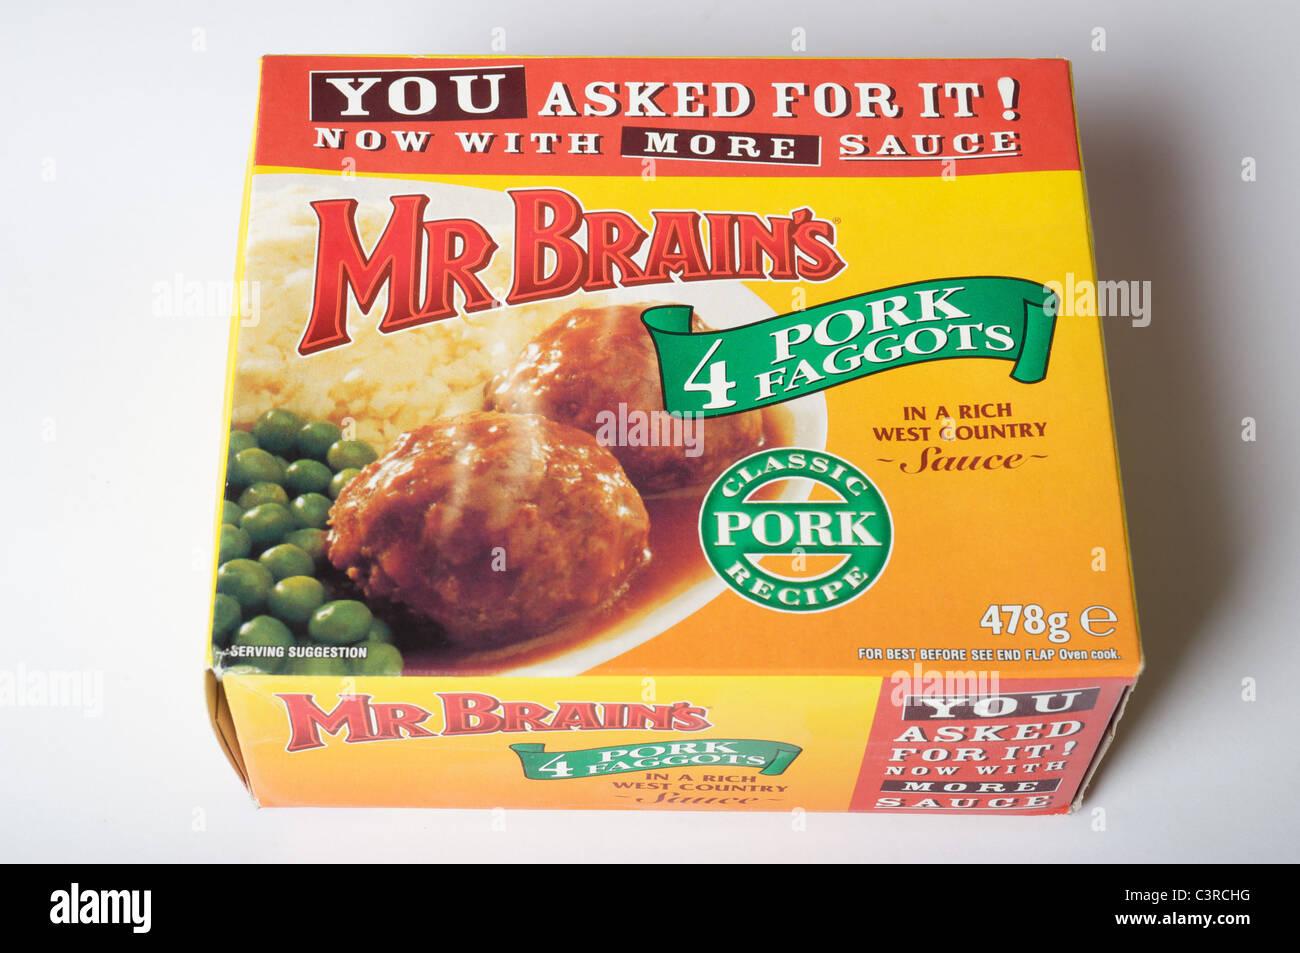 Mr Brains pork faggots - Stock Image